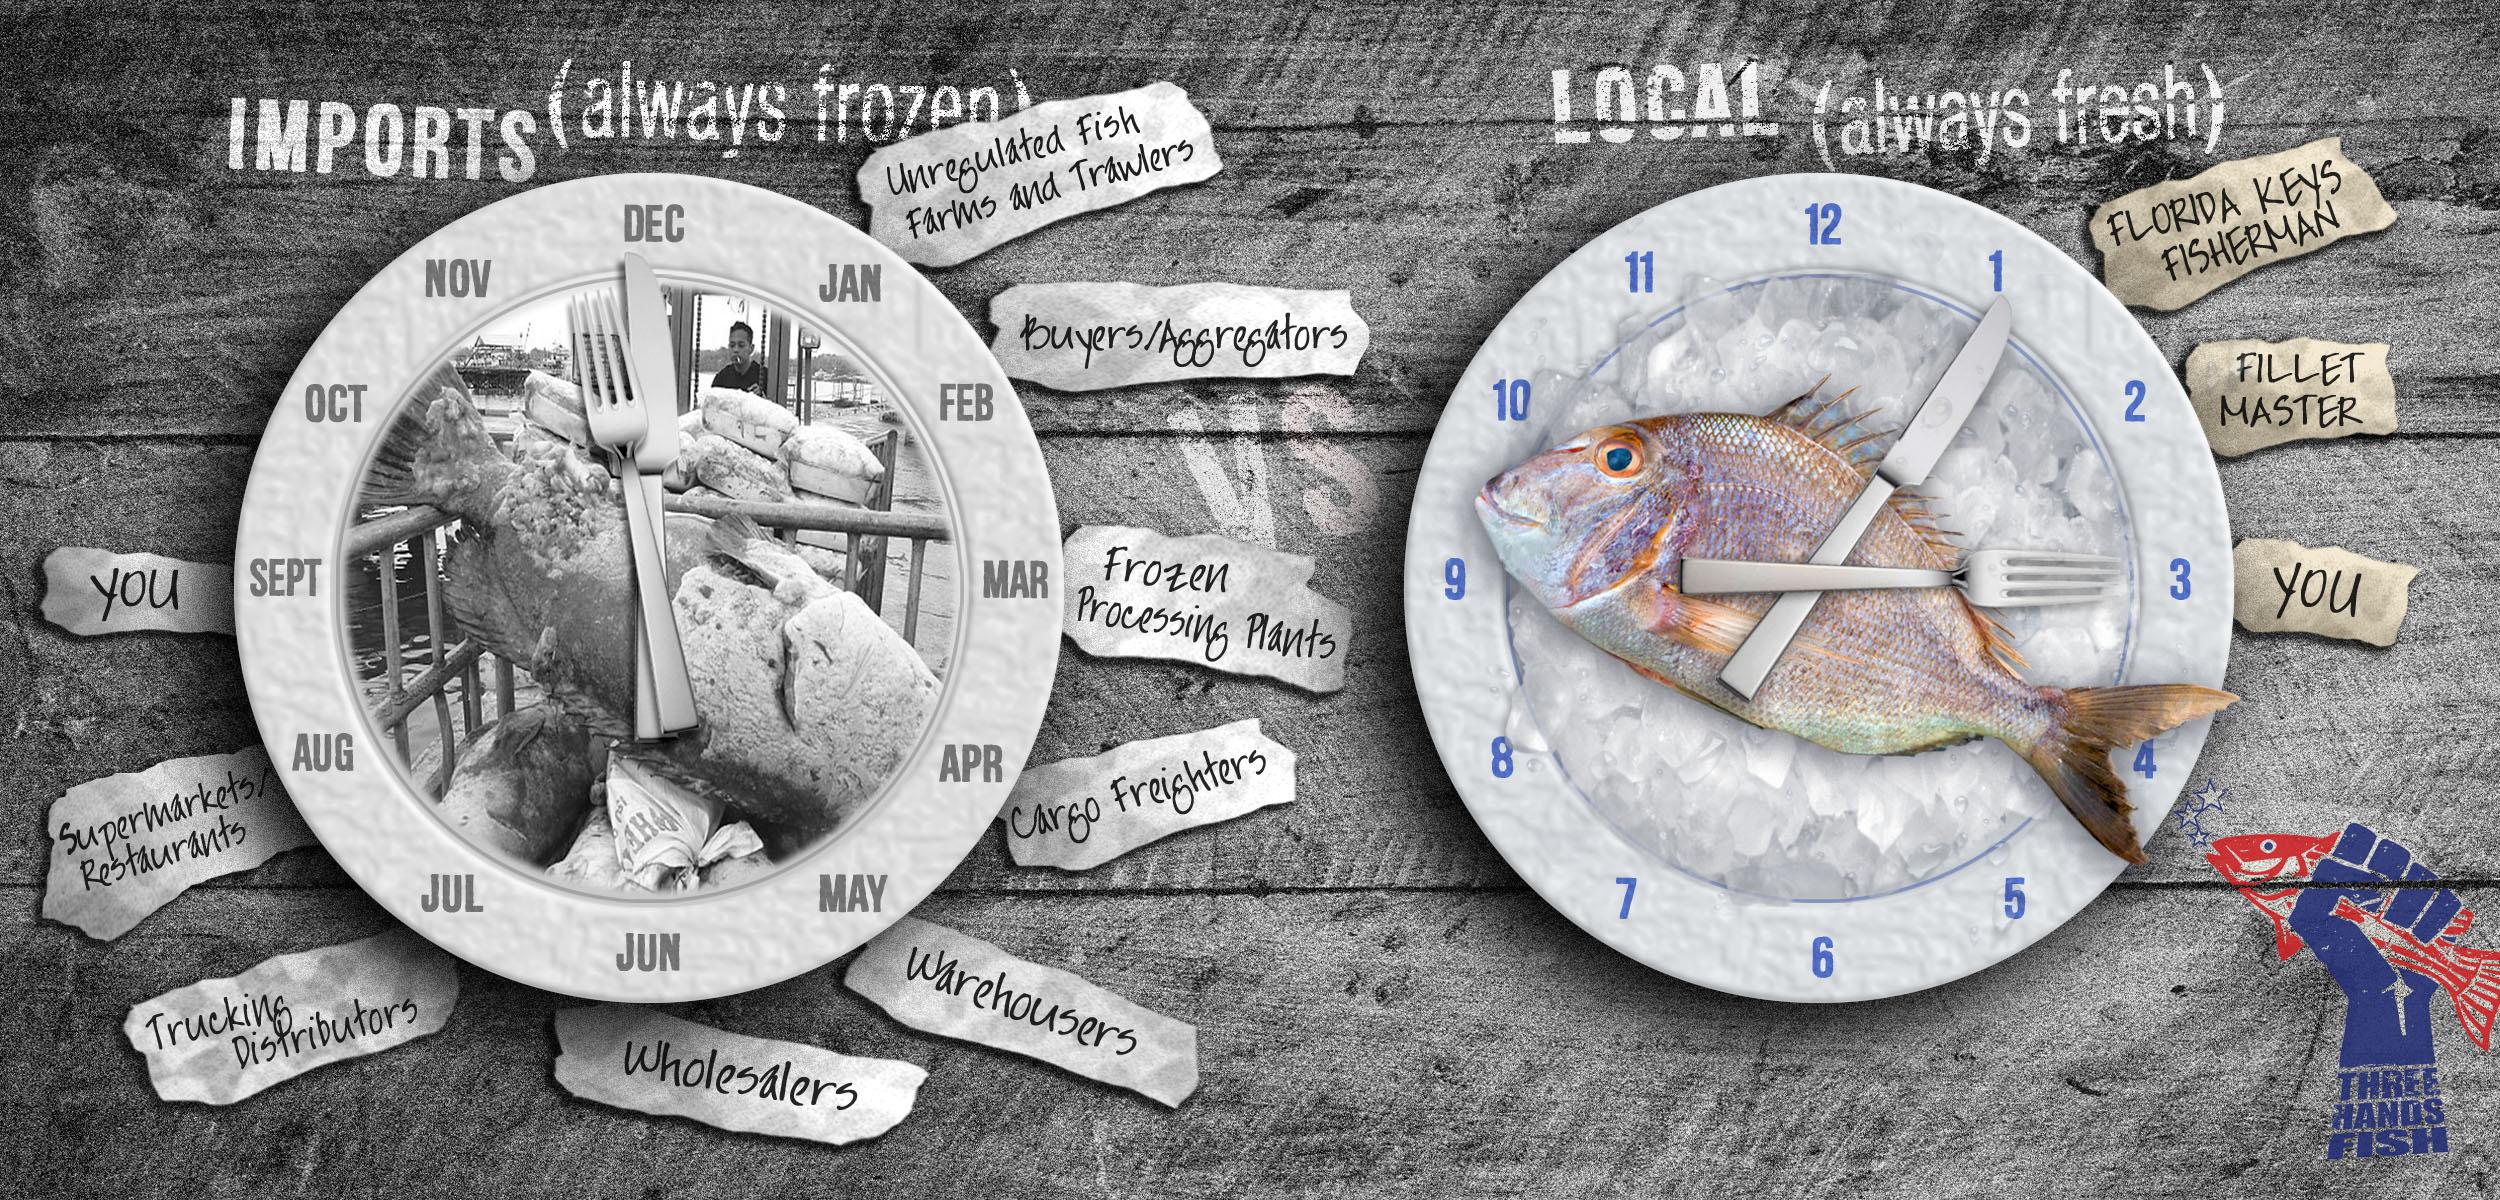 FINAL_Layout Concept Comparison THF Web Banner 11.8.16.jpg